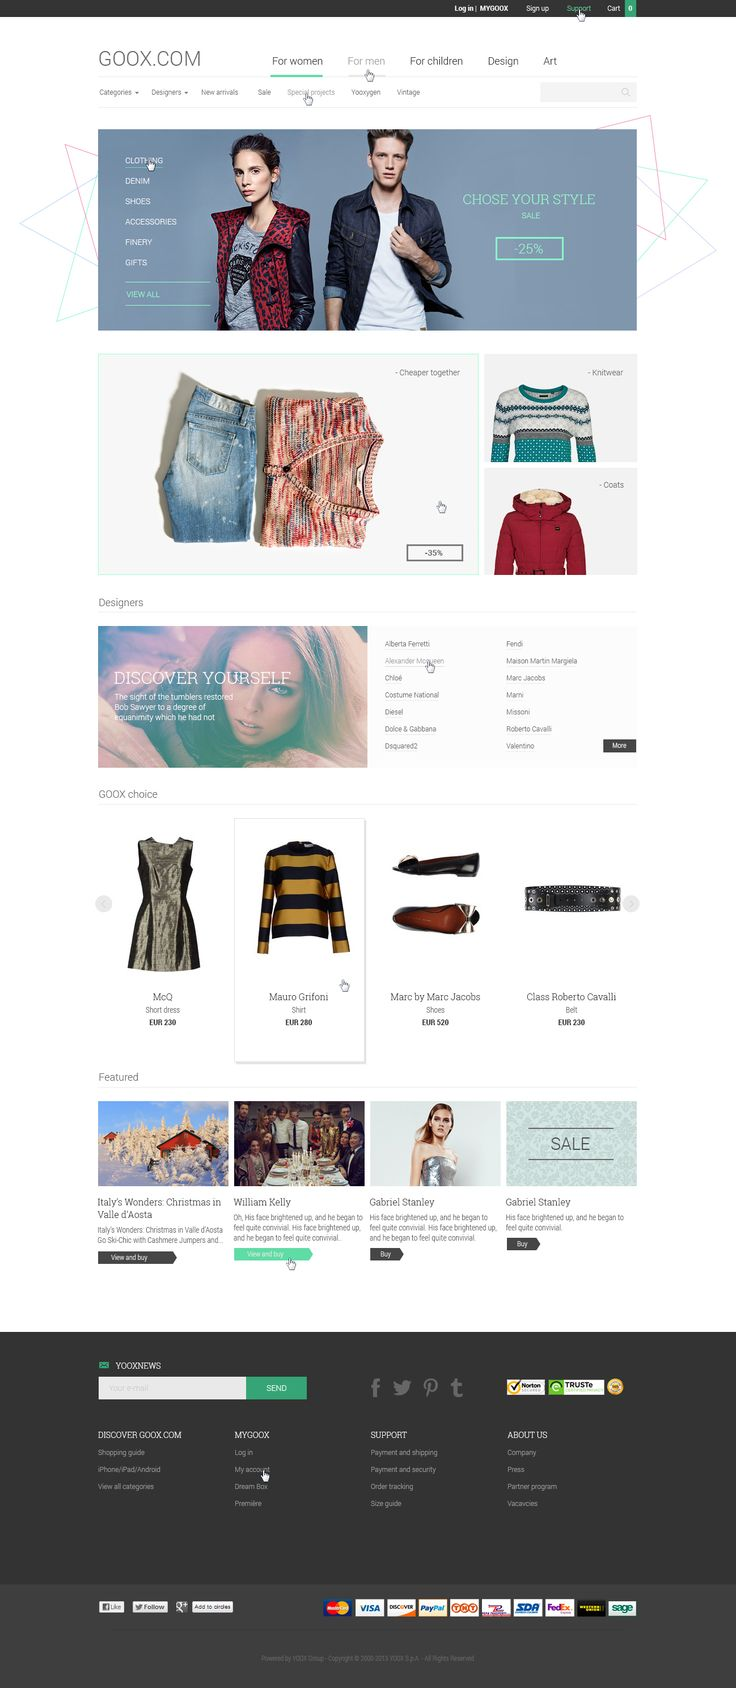 Сайт интернет-магазина одежды в стиле минимализма #web #design #business #minimalism #working #marketing #cool #creative